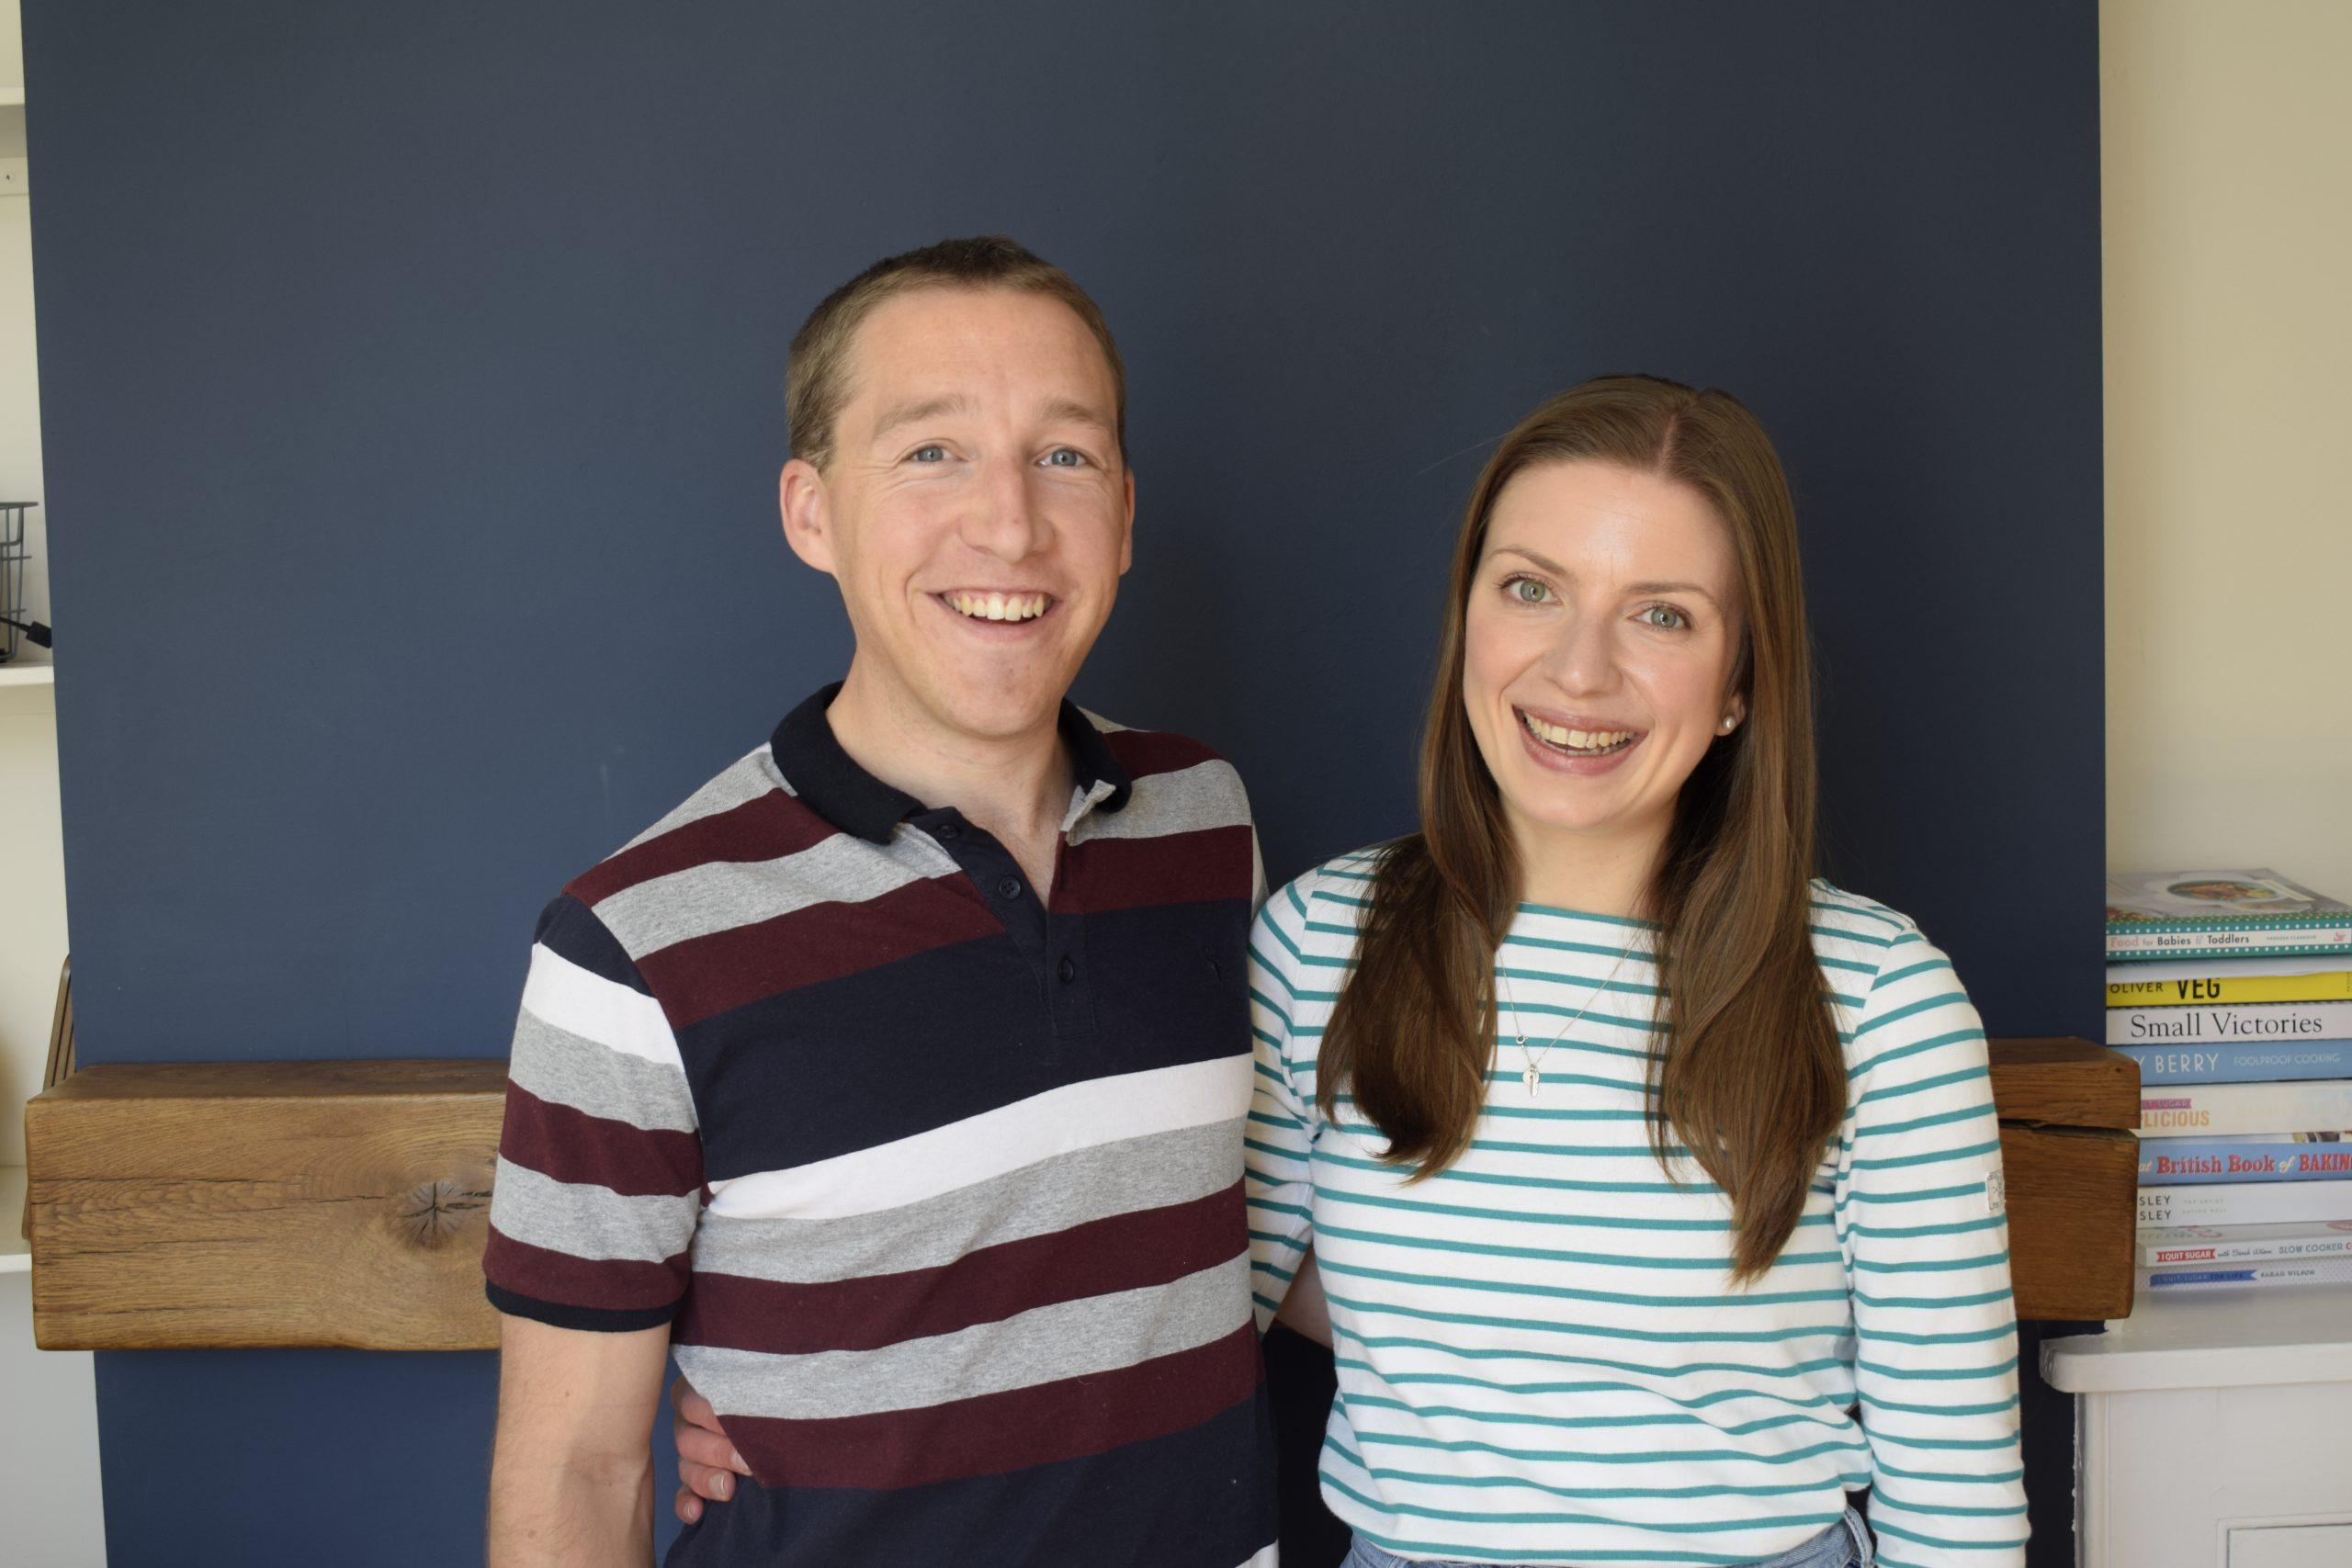 David and Emma Lowries